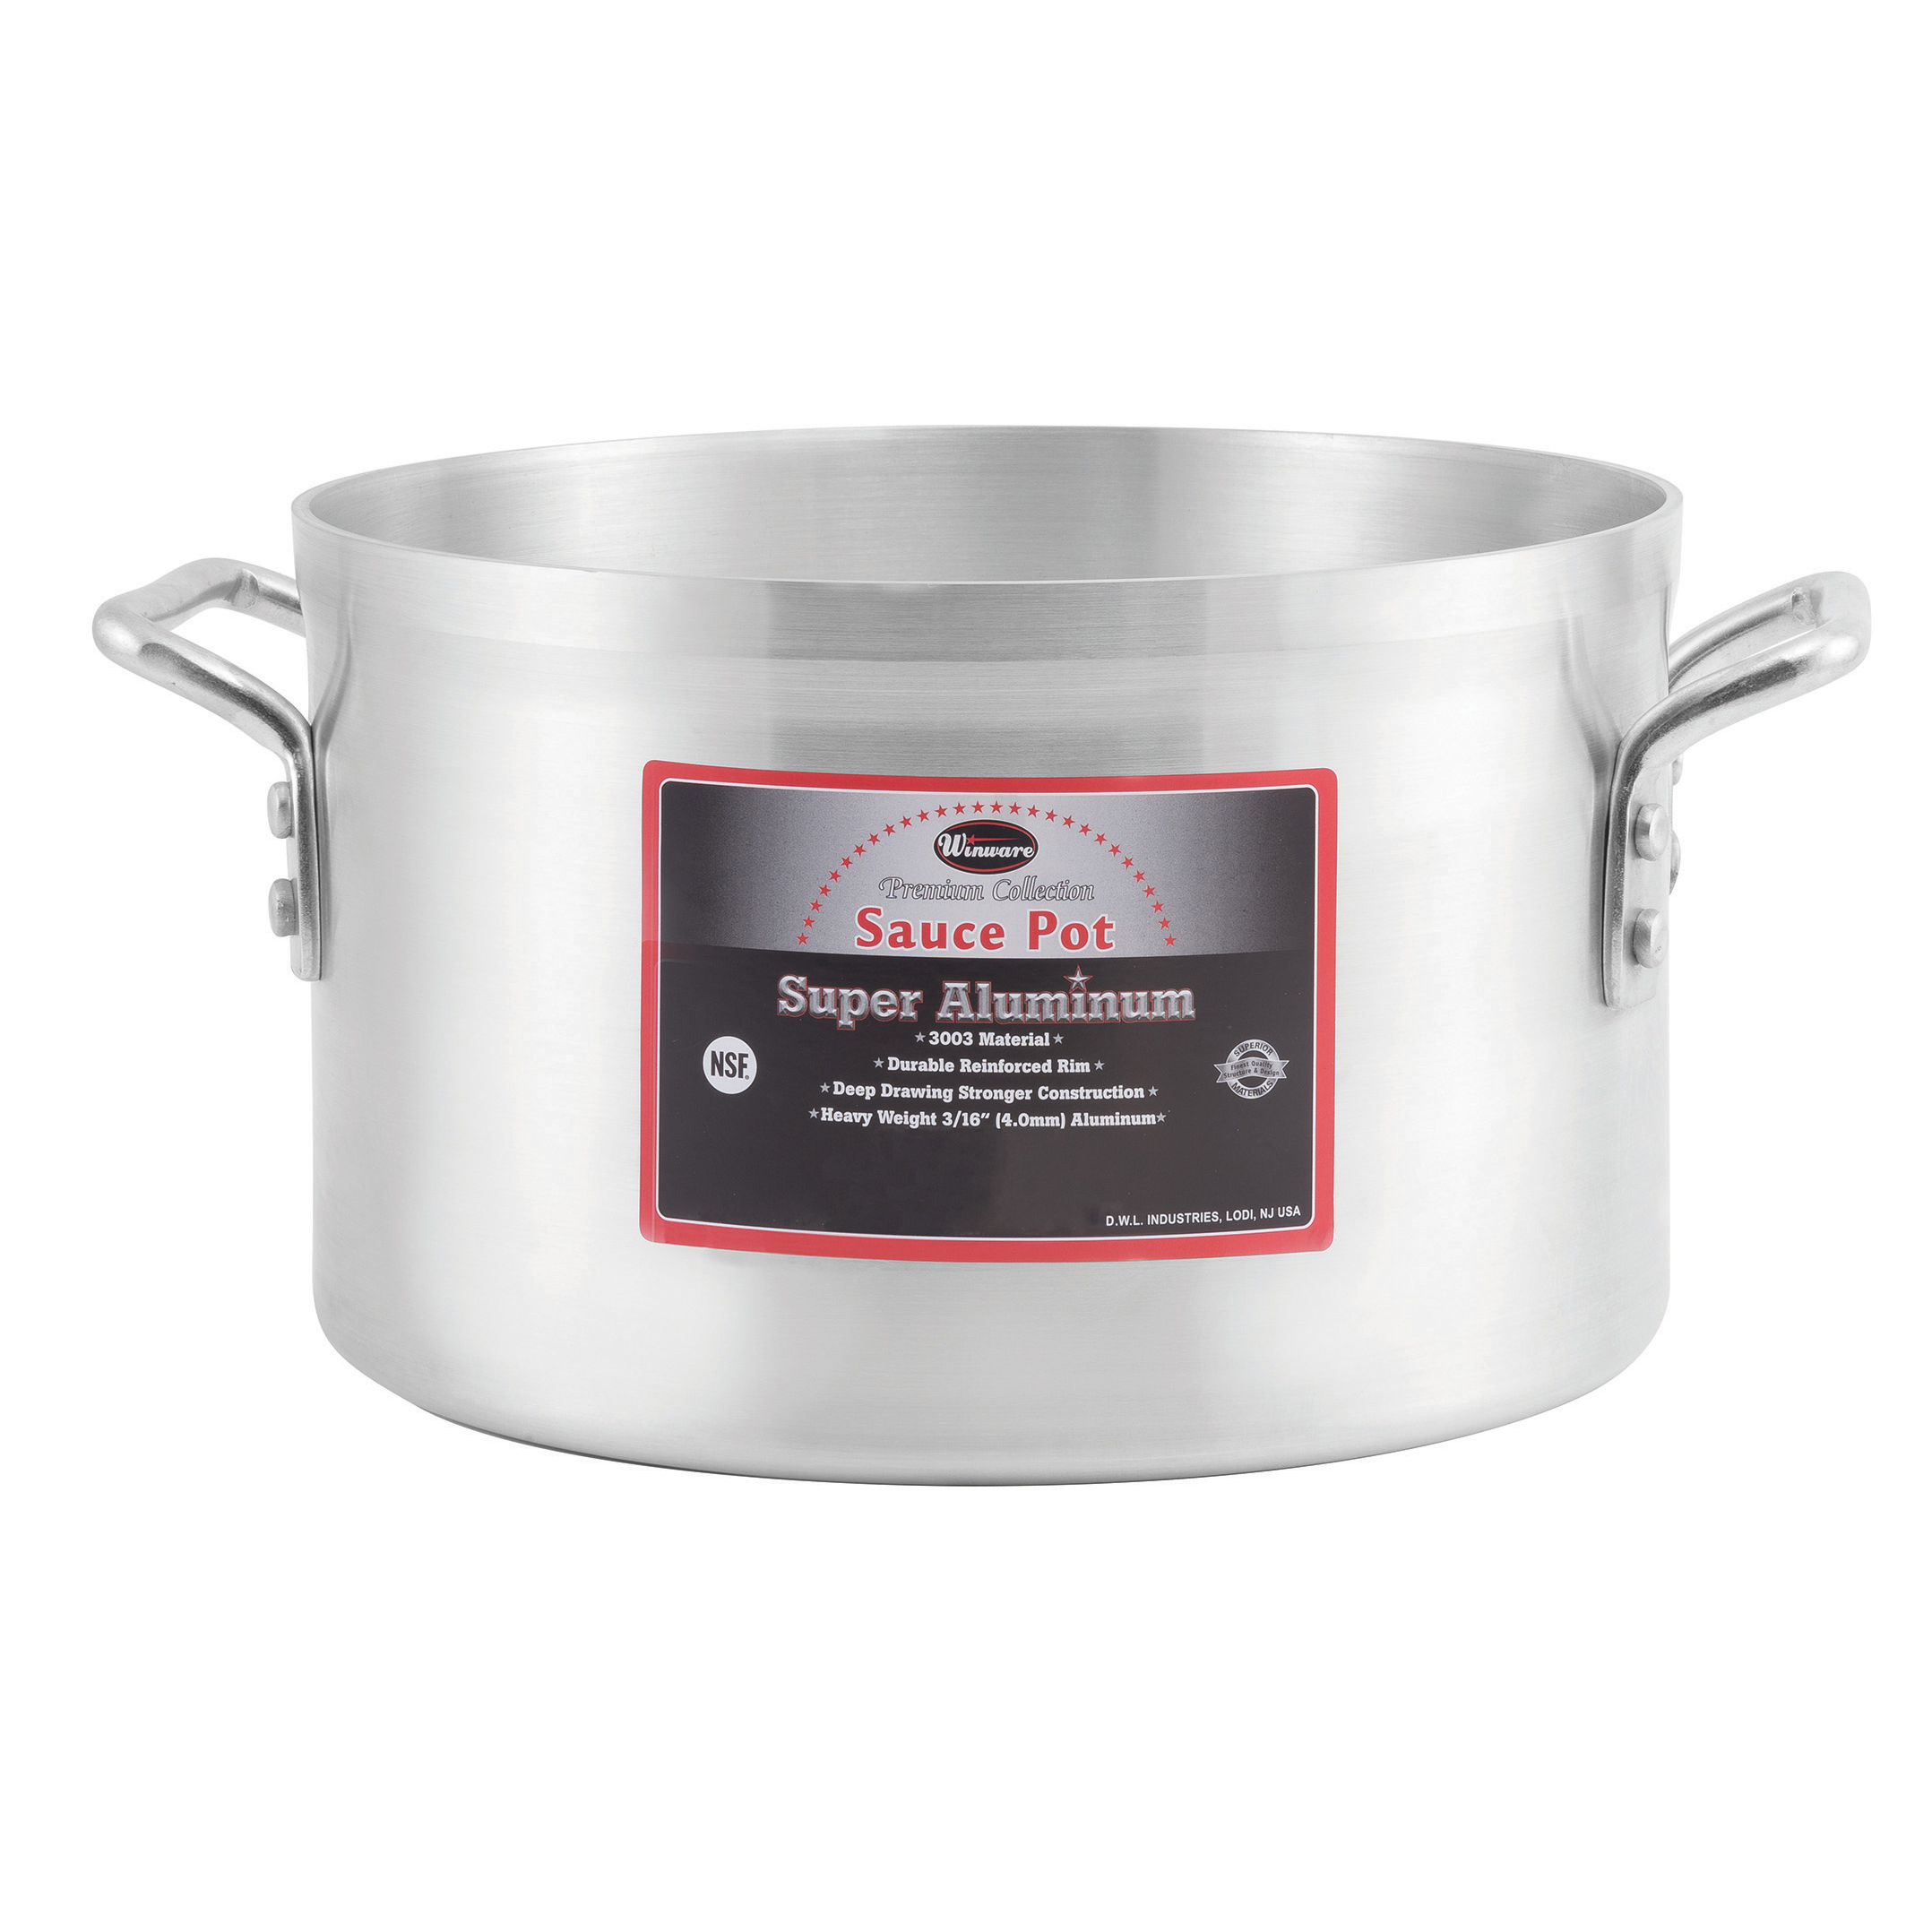 Winco AXAP-26 sauce pot